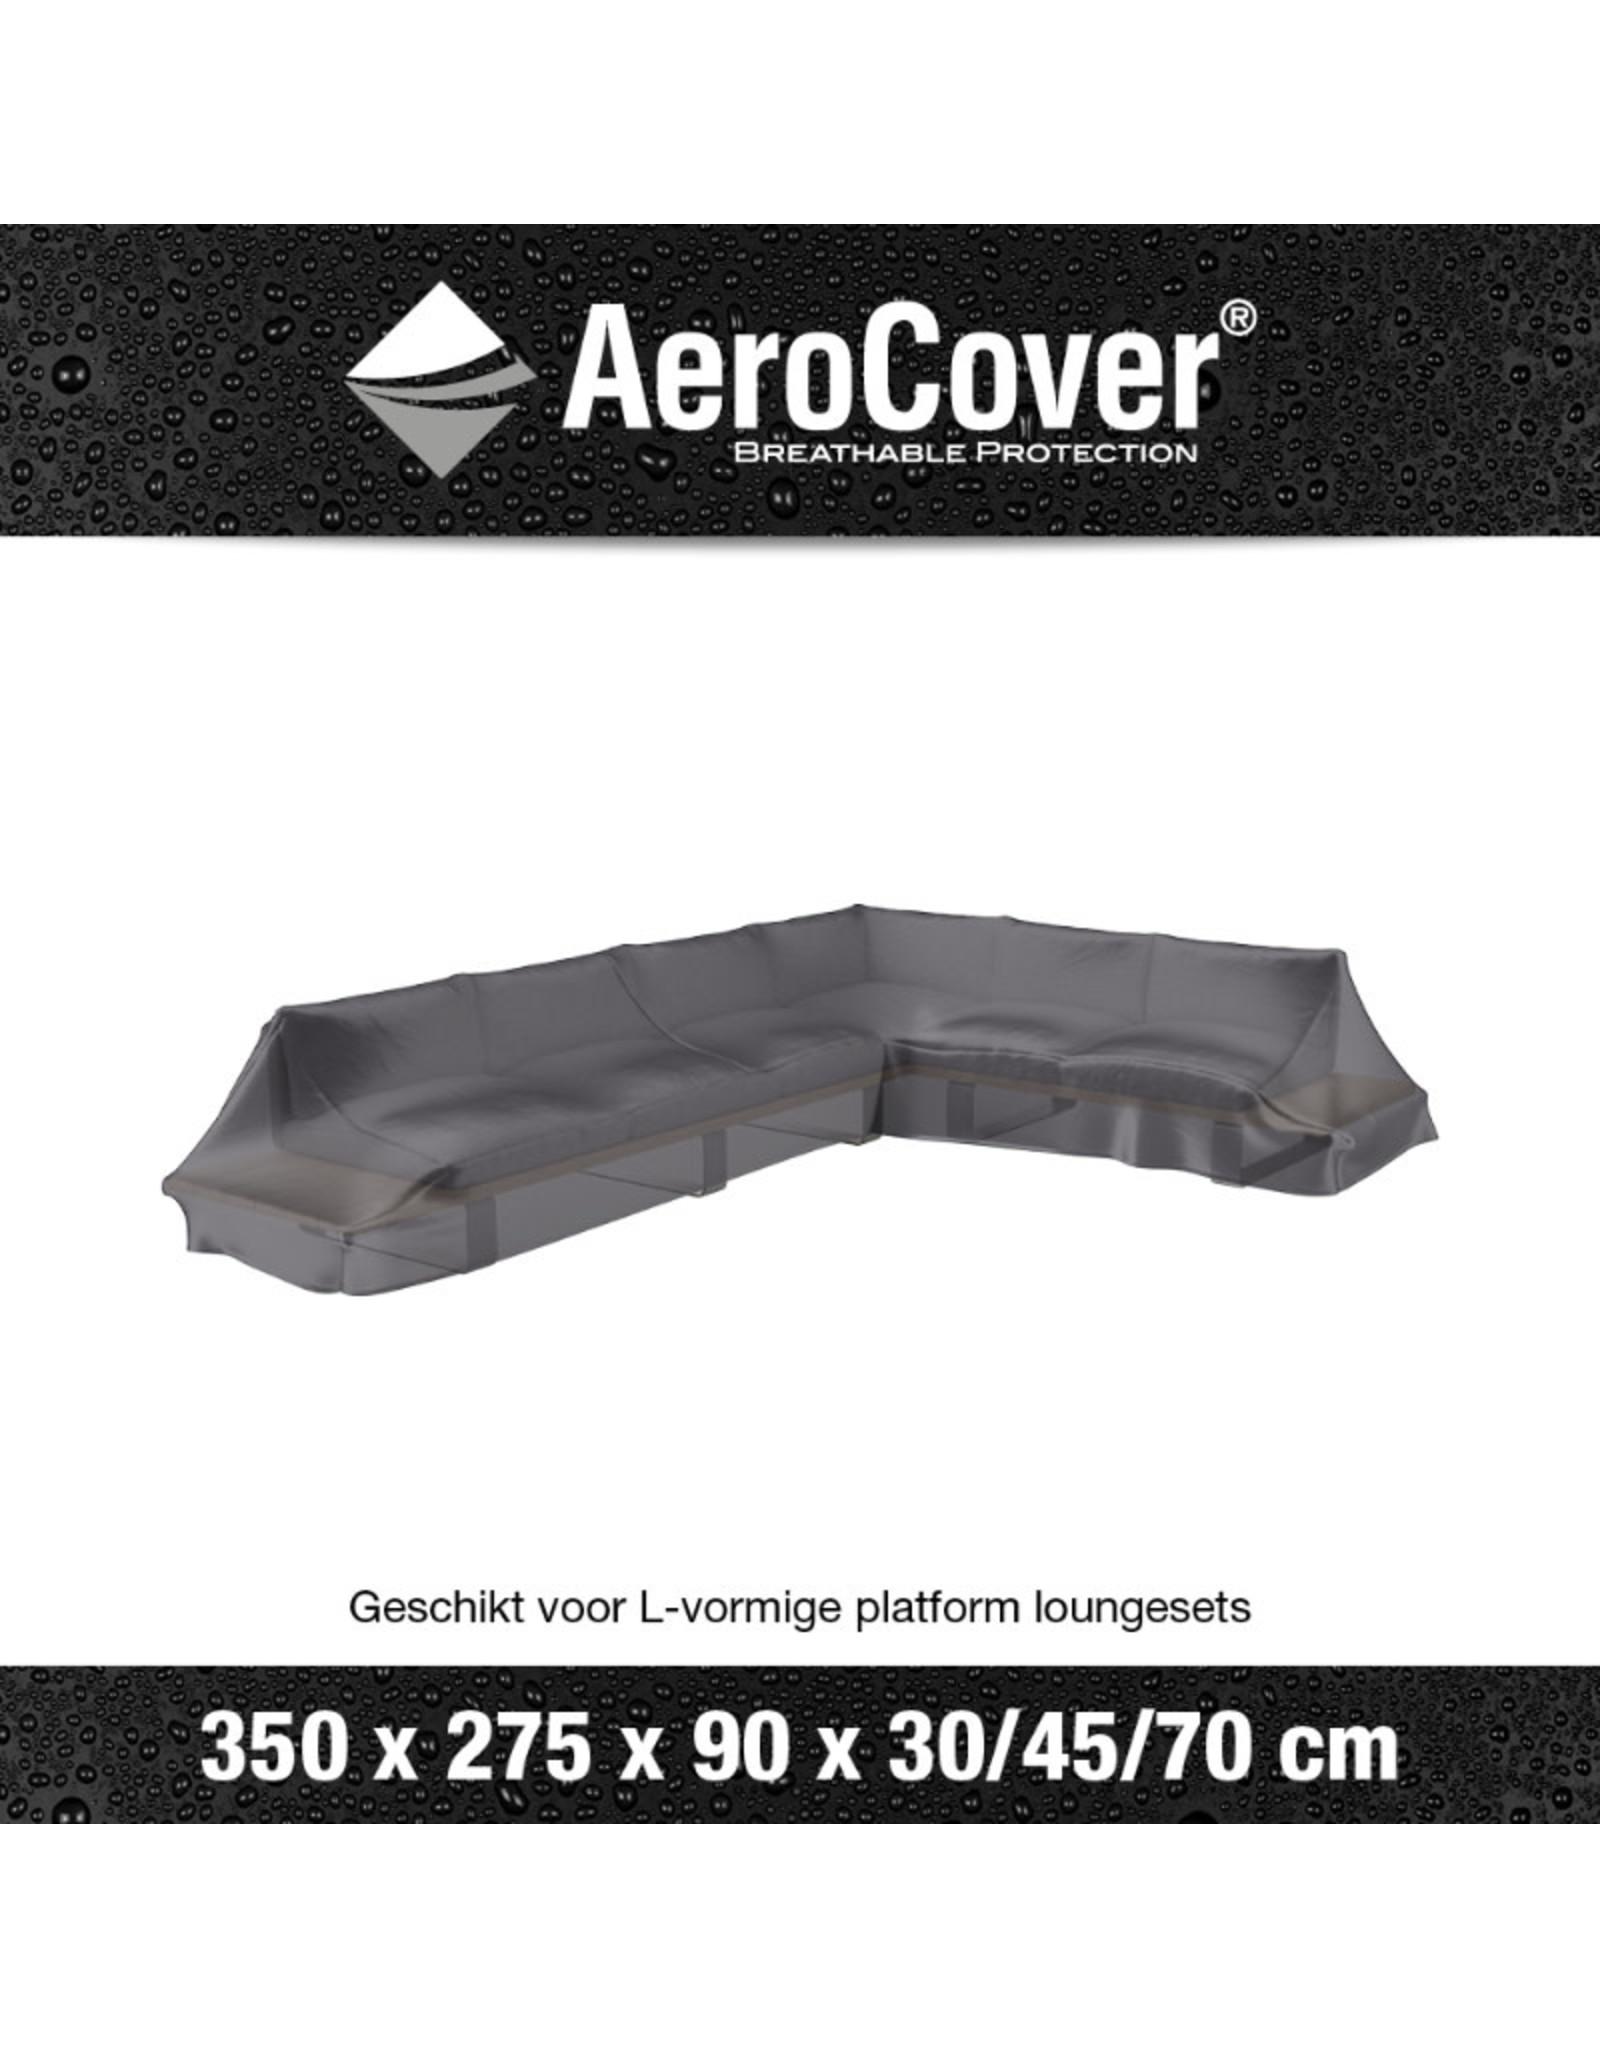 Aerocover AeroCover Loungeset platformhoes rechts 350x275x90xH30-45-70